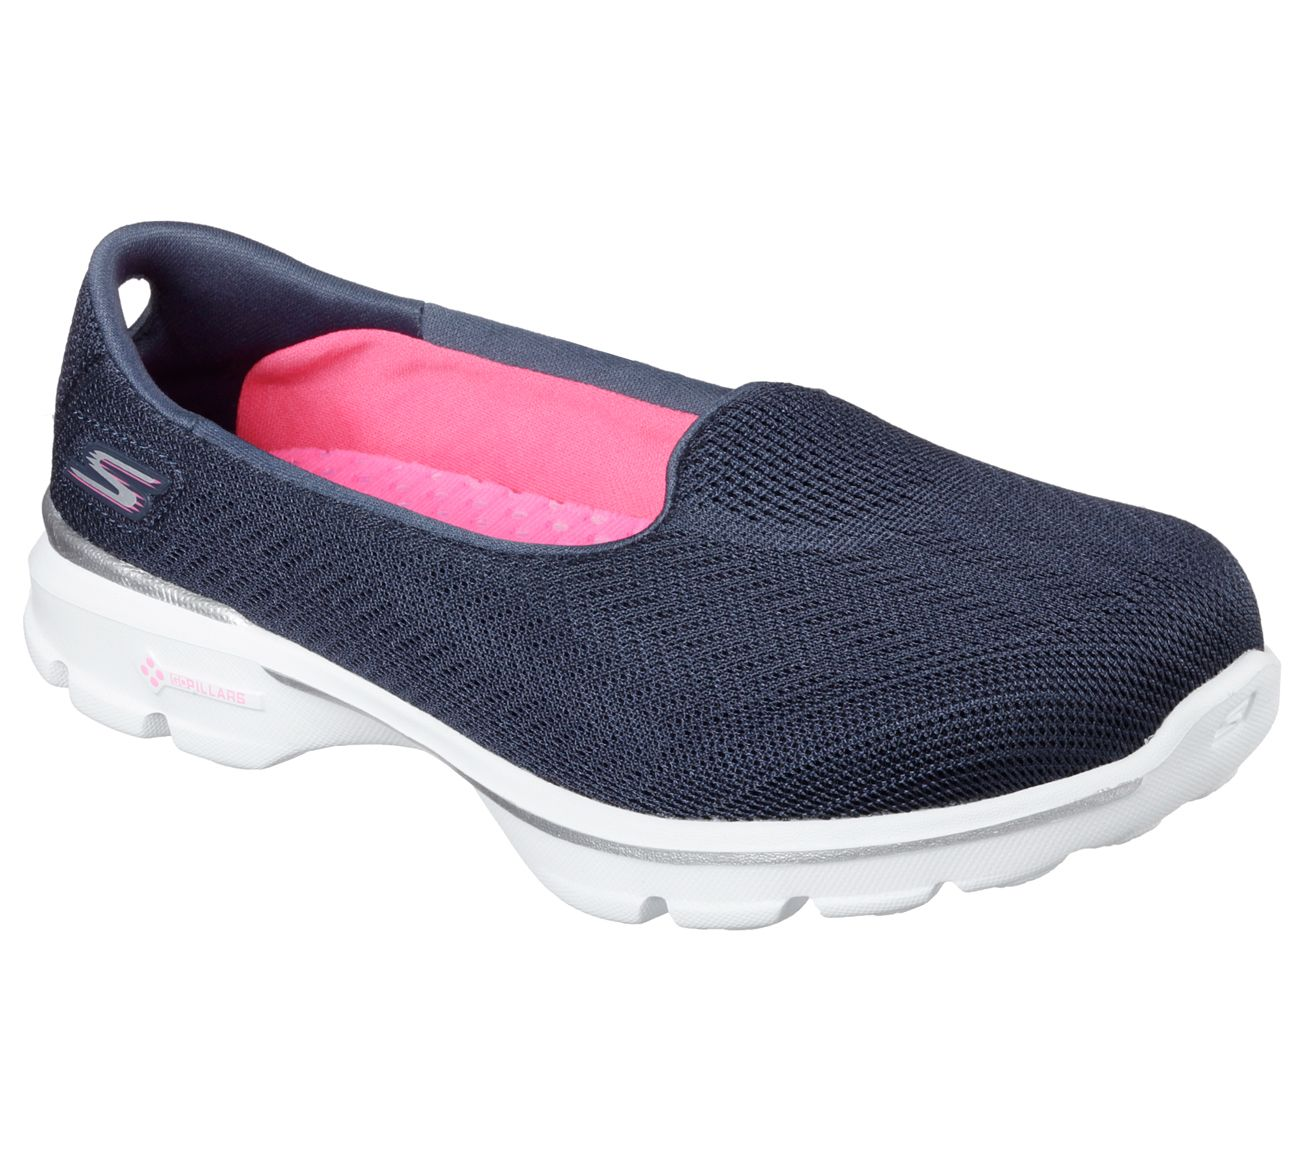 Skechers Go Walk 3 Skechers- Pink casual shoes